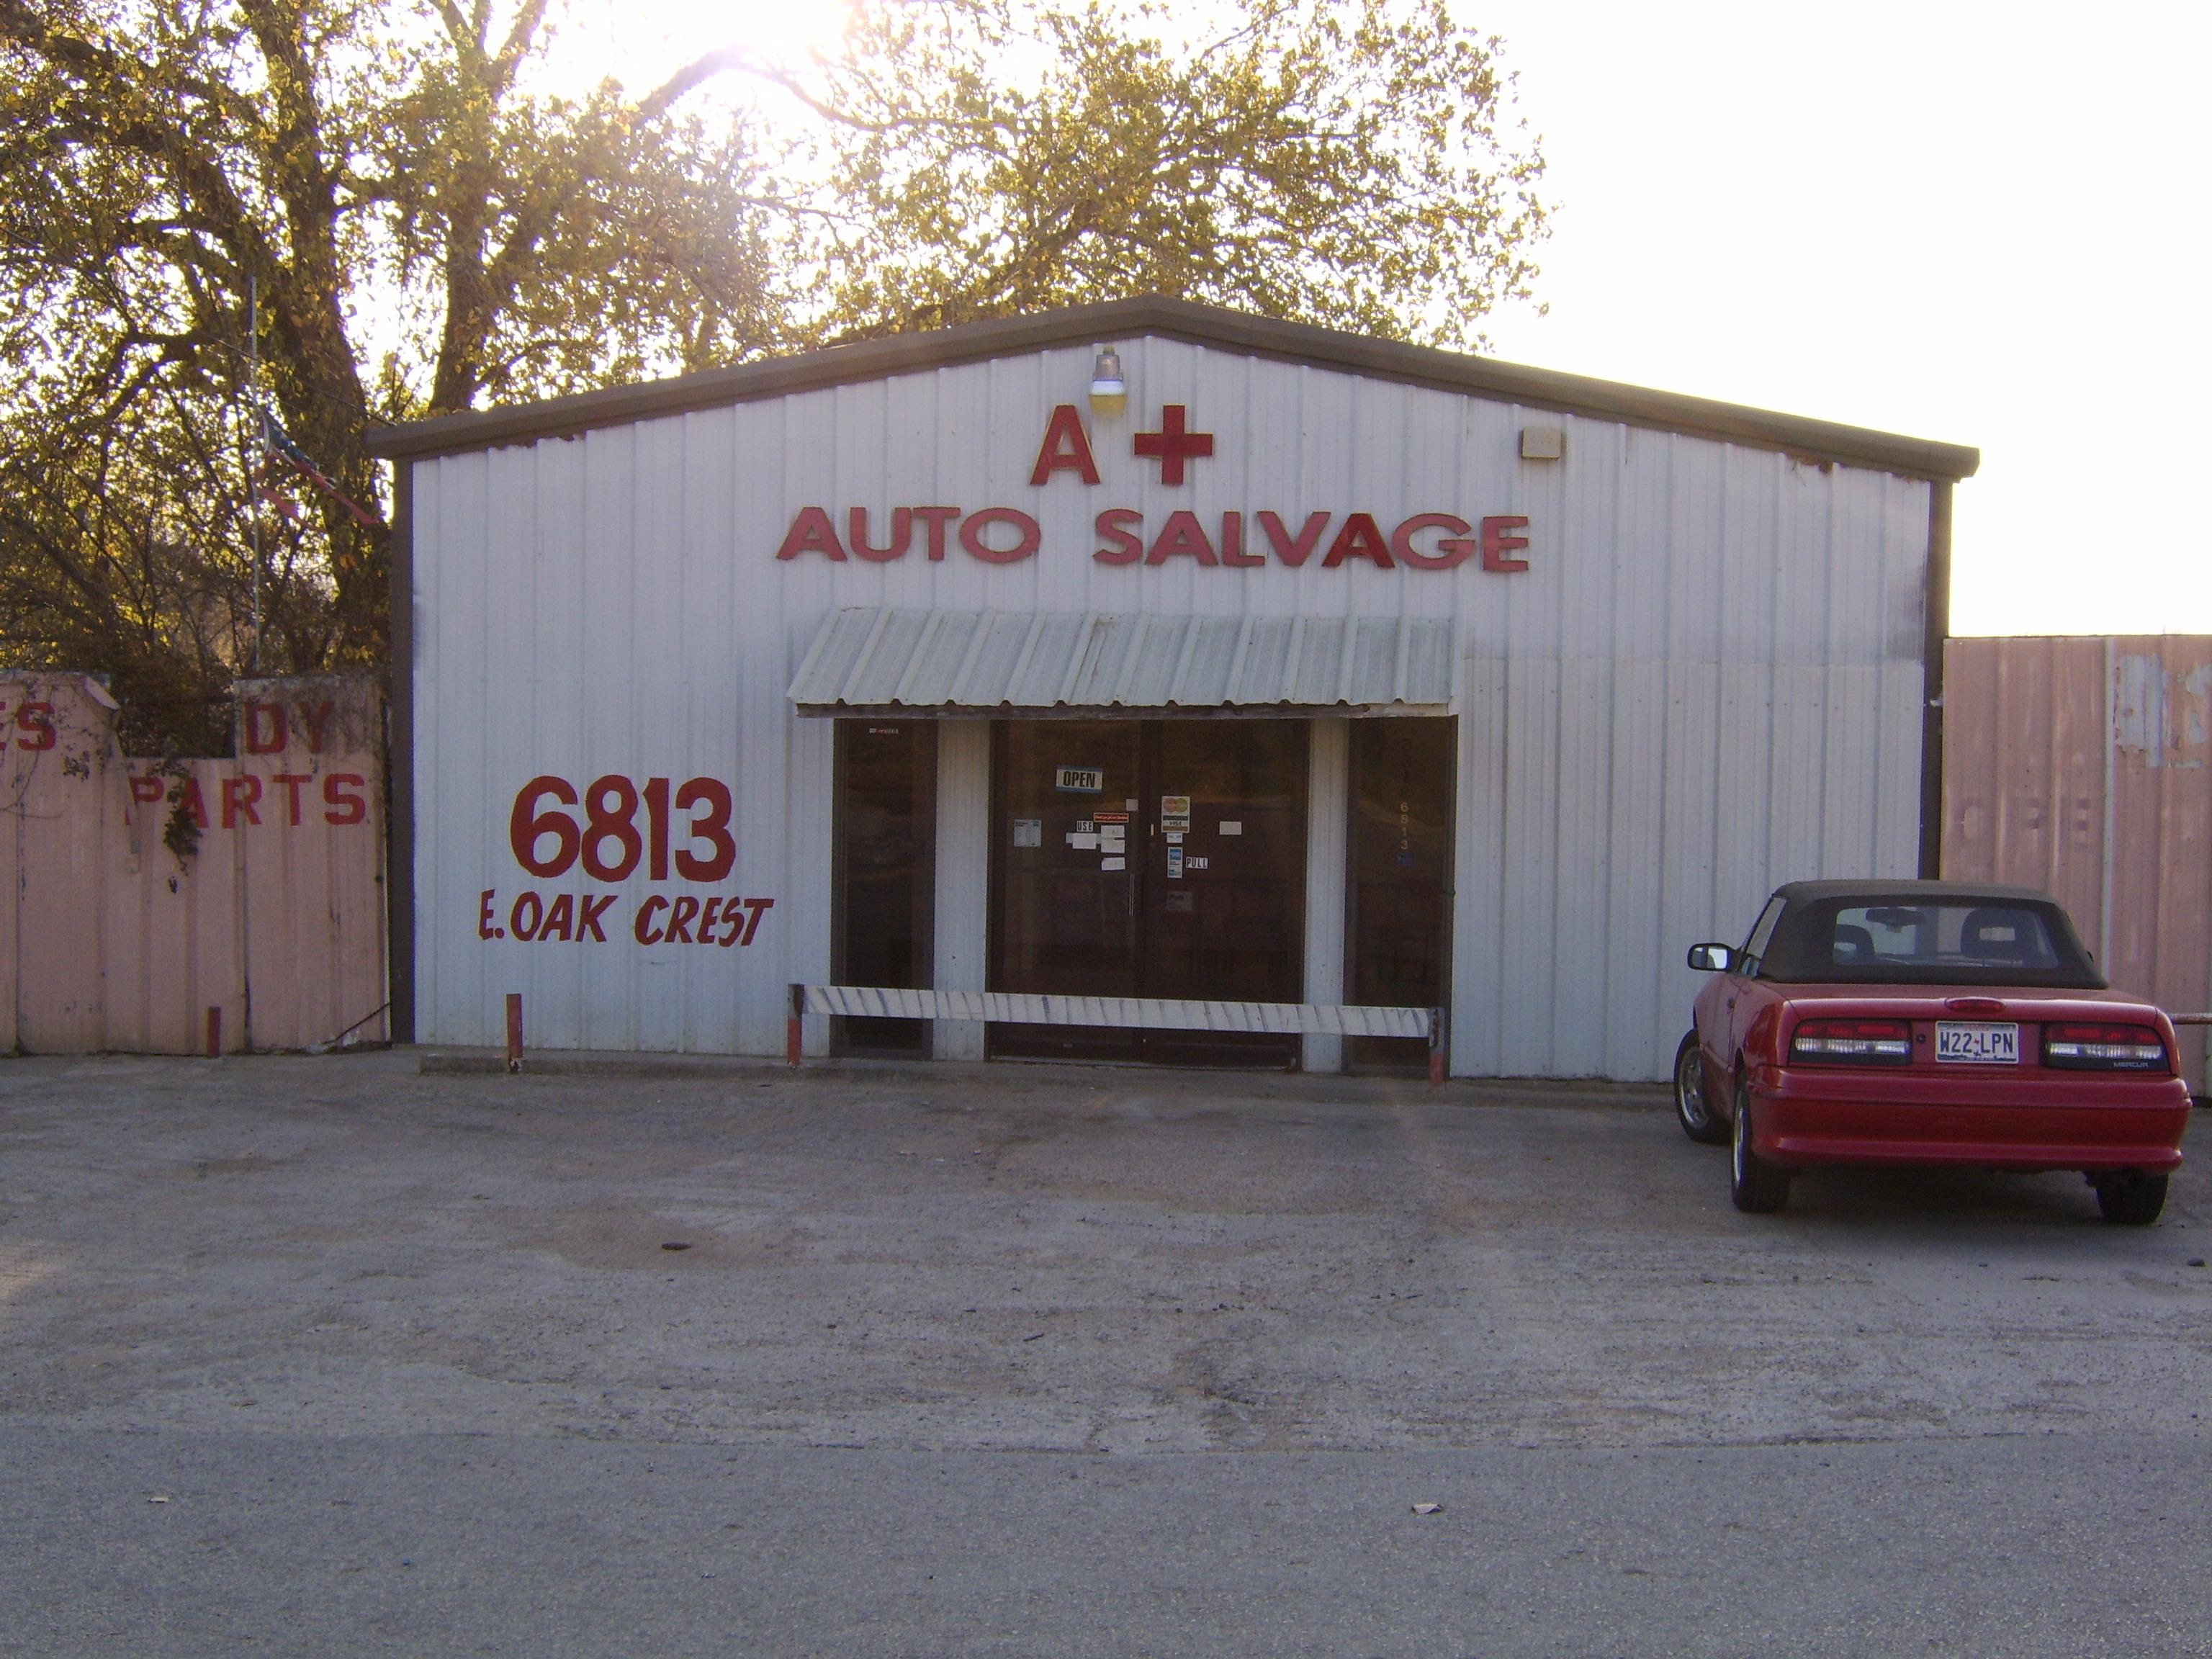 Honda Express Service Fort Worth U003eu003e A Plus Auto Salvage   Fort Worth, TX